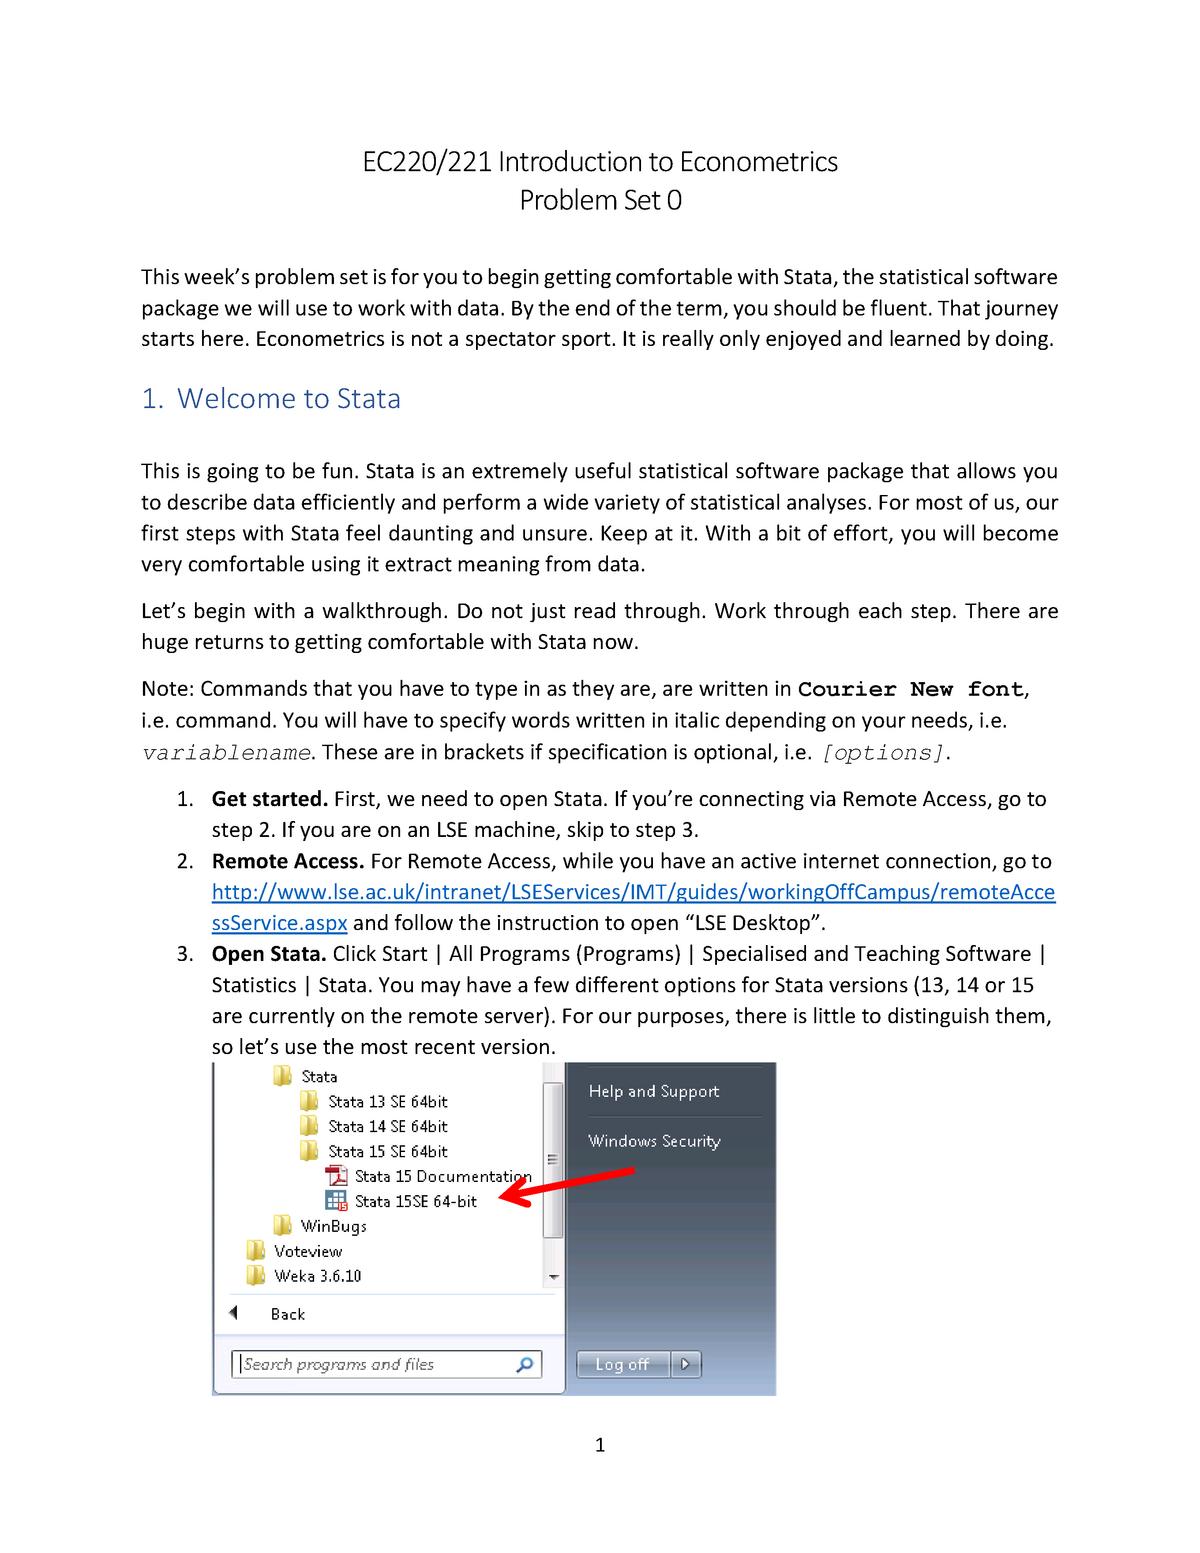 EC220 - hw answer - EC220: Introduction to Econometrics